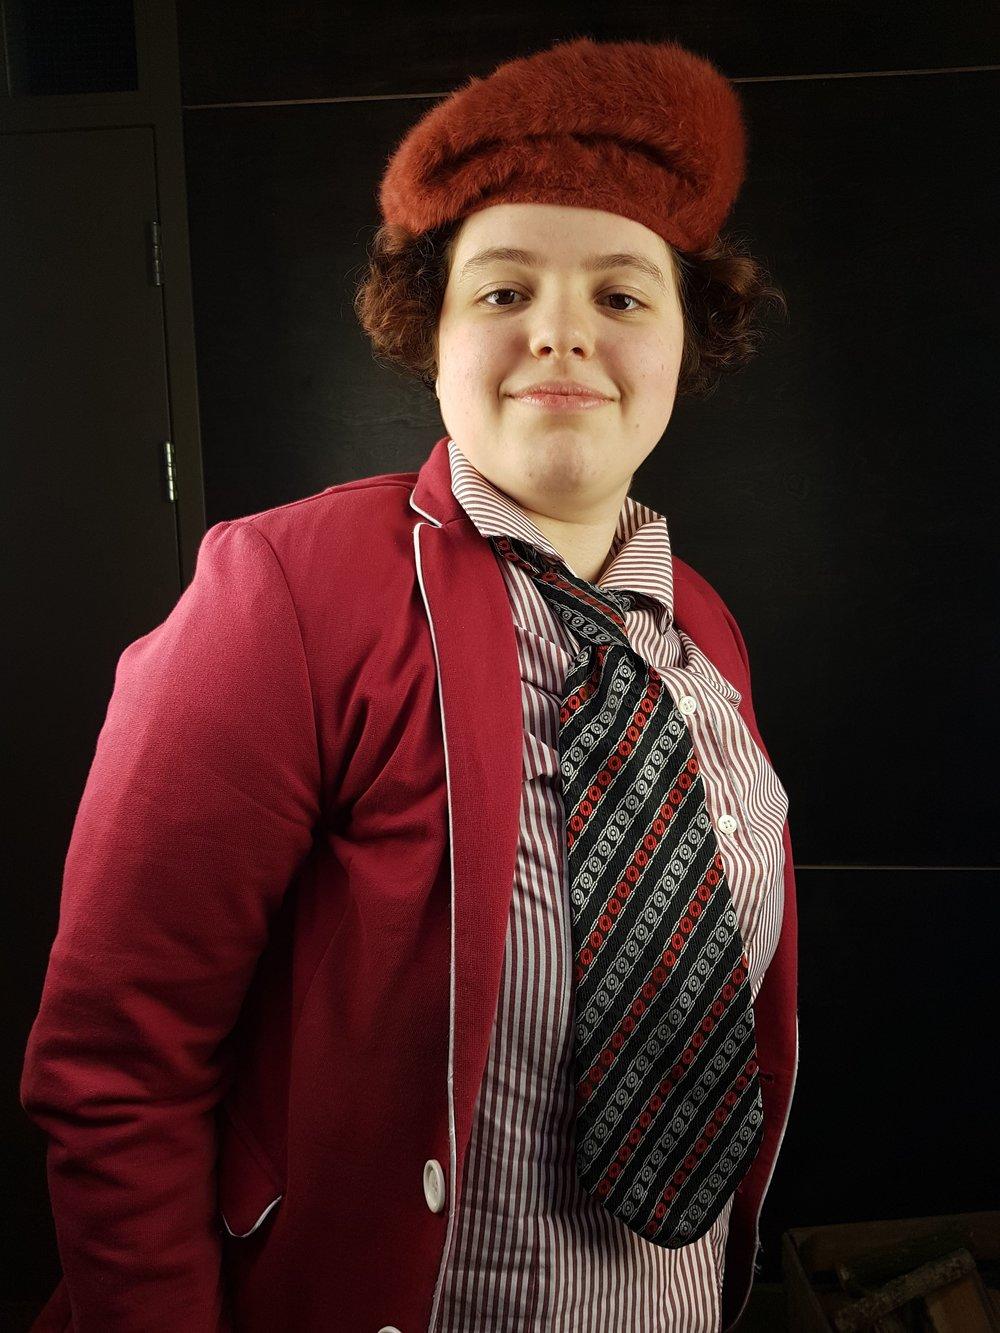 Shirley - sterk karakter, muzikaal genie en serieuze nieuwsmaakster.